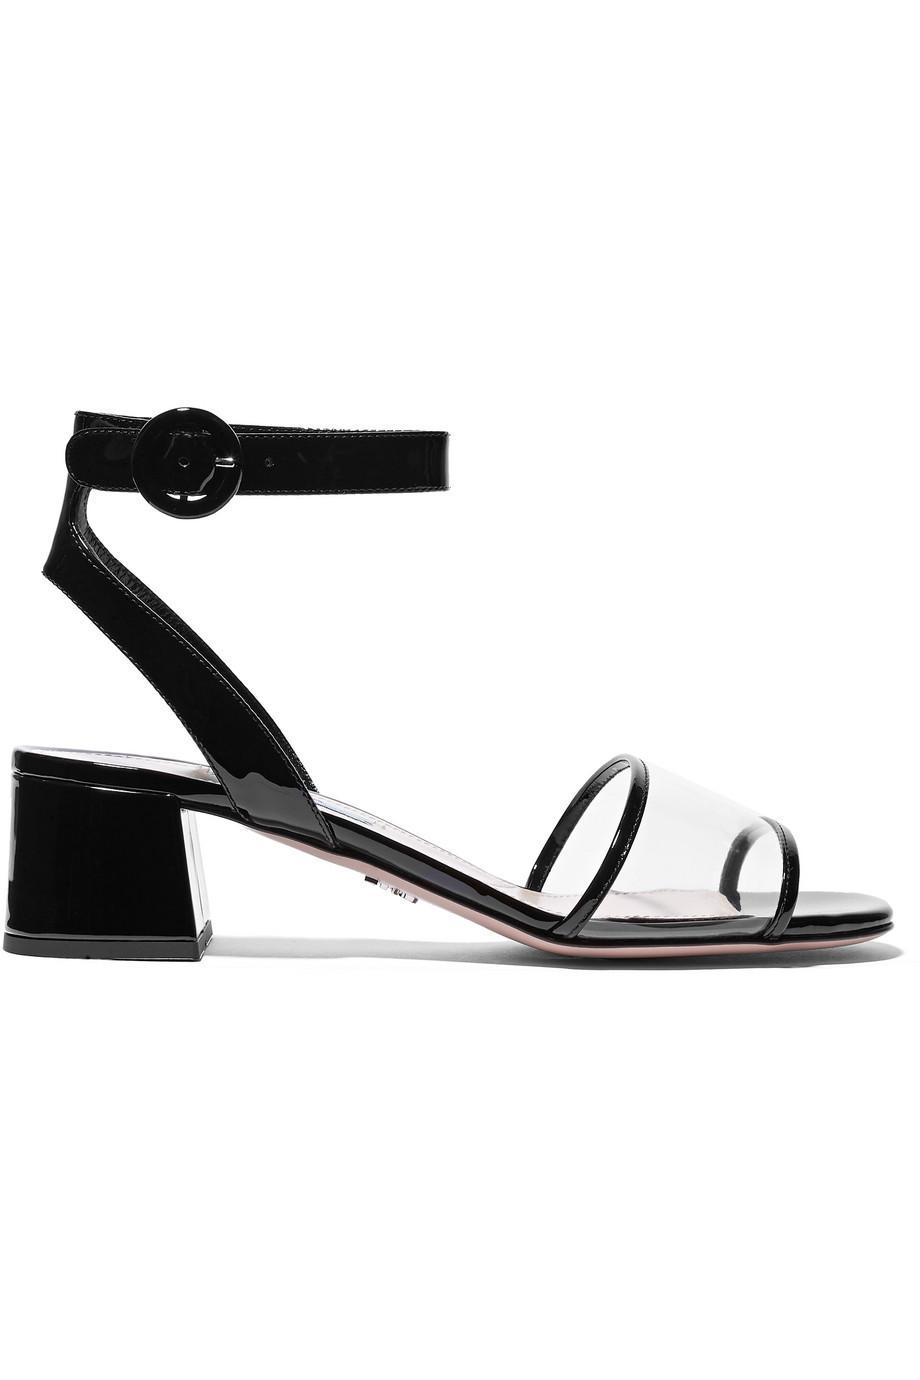 Patent-leather And Pvc Sandals - Black Prada HgptBKqt1P